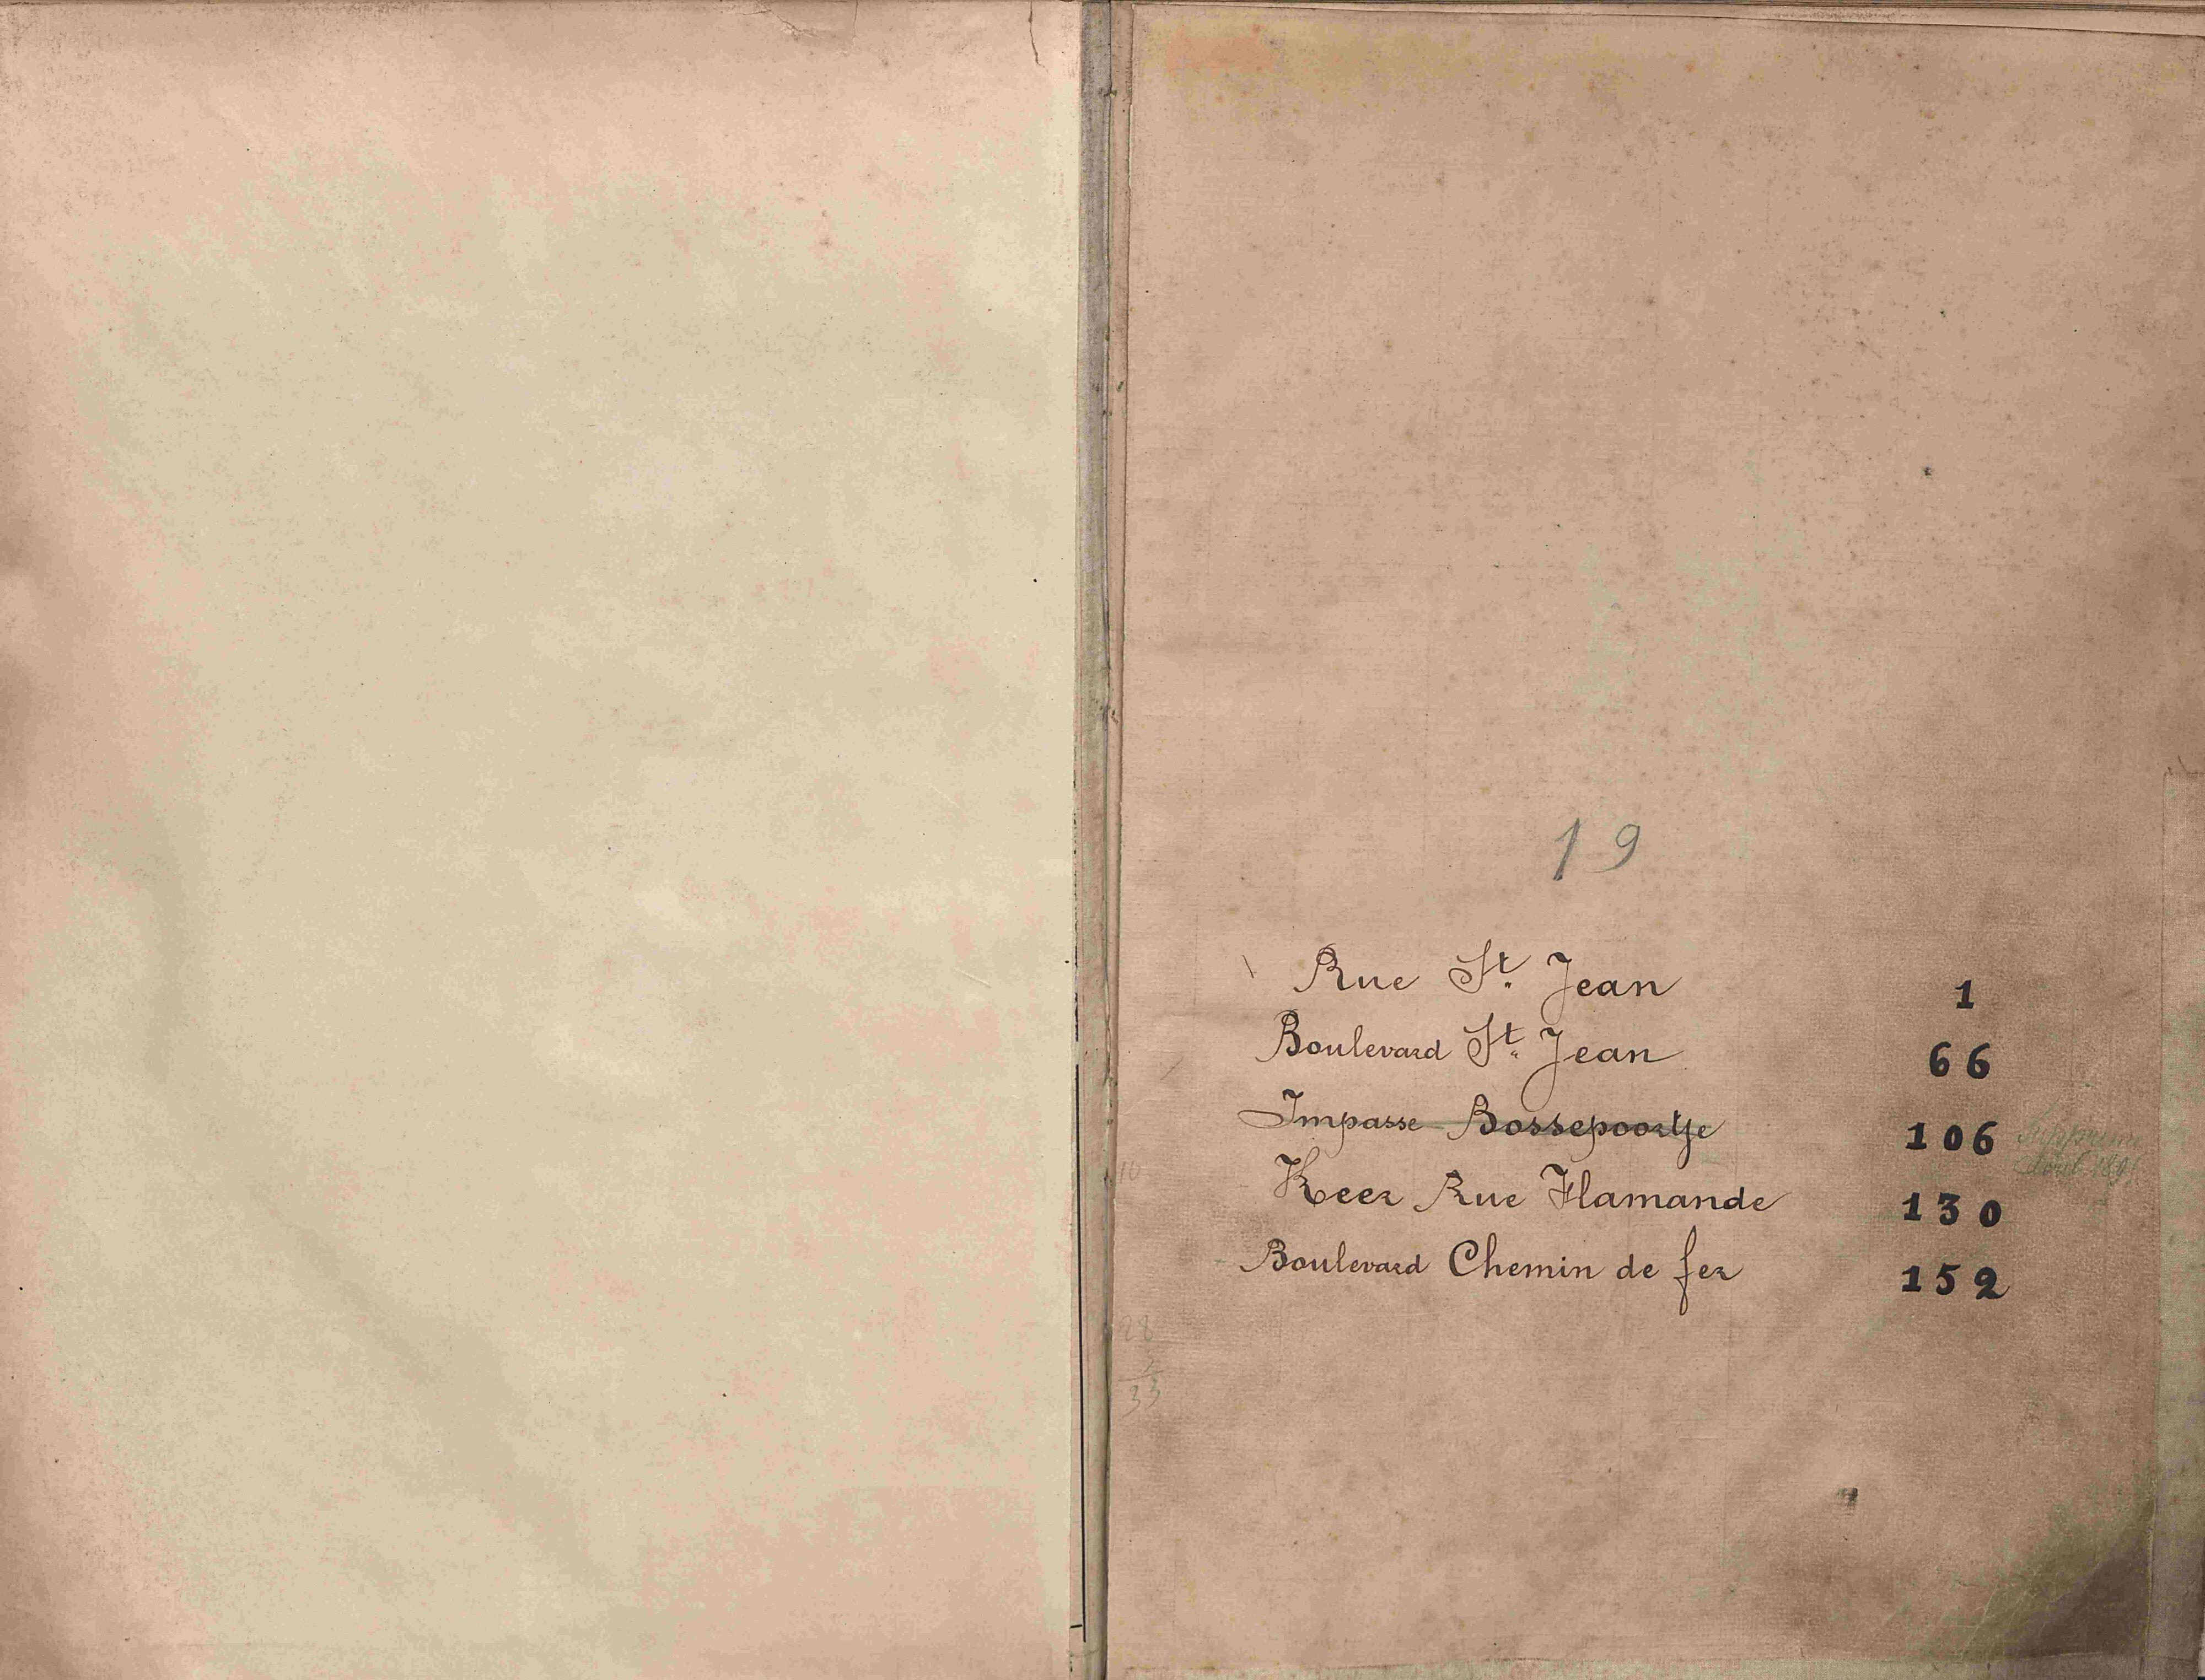 Bevolkingsregister Kortrijk 1890 boek 19